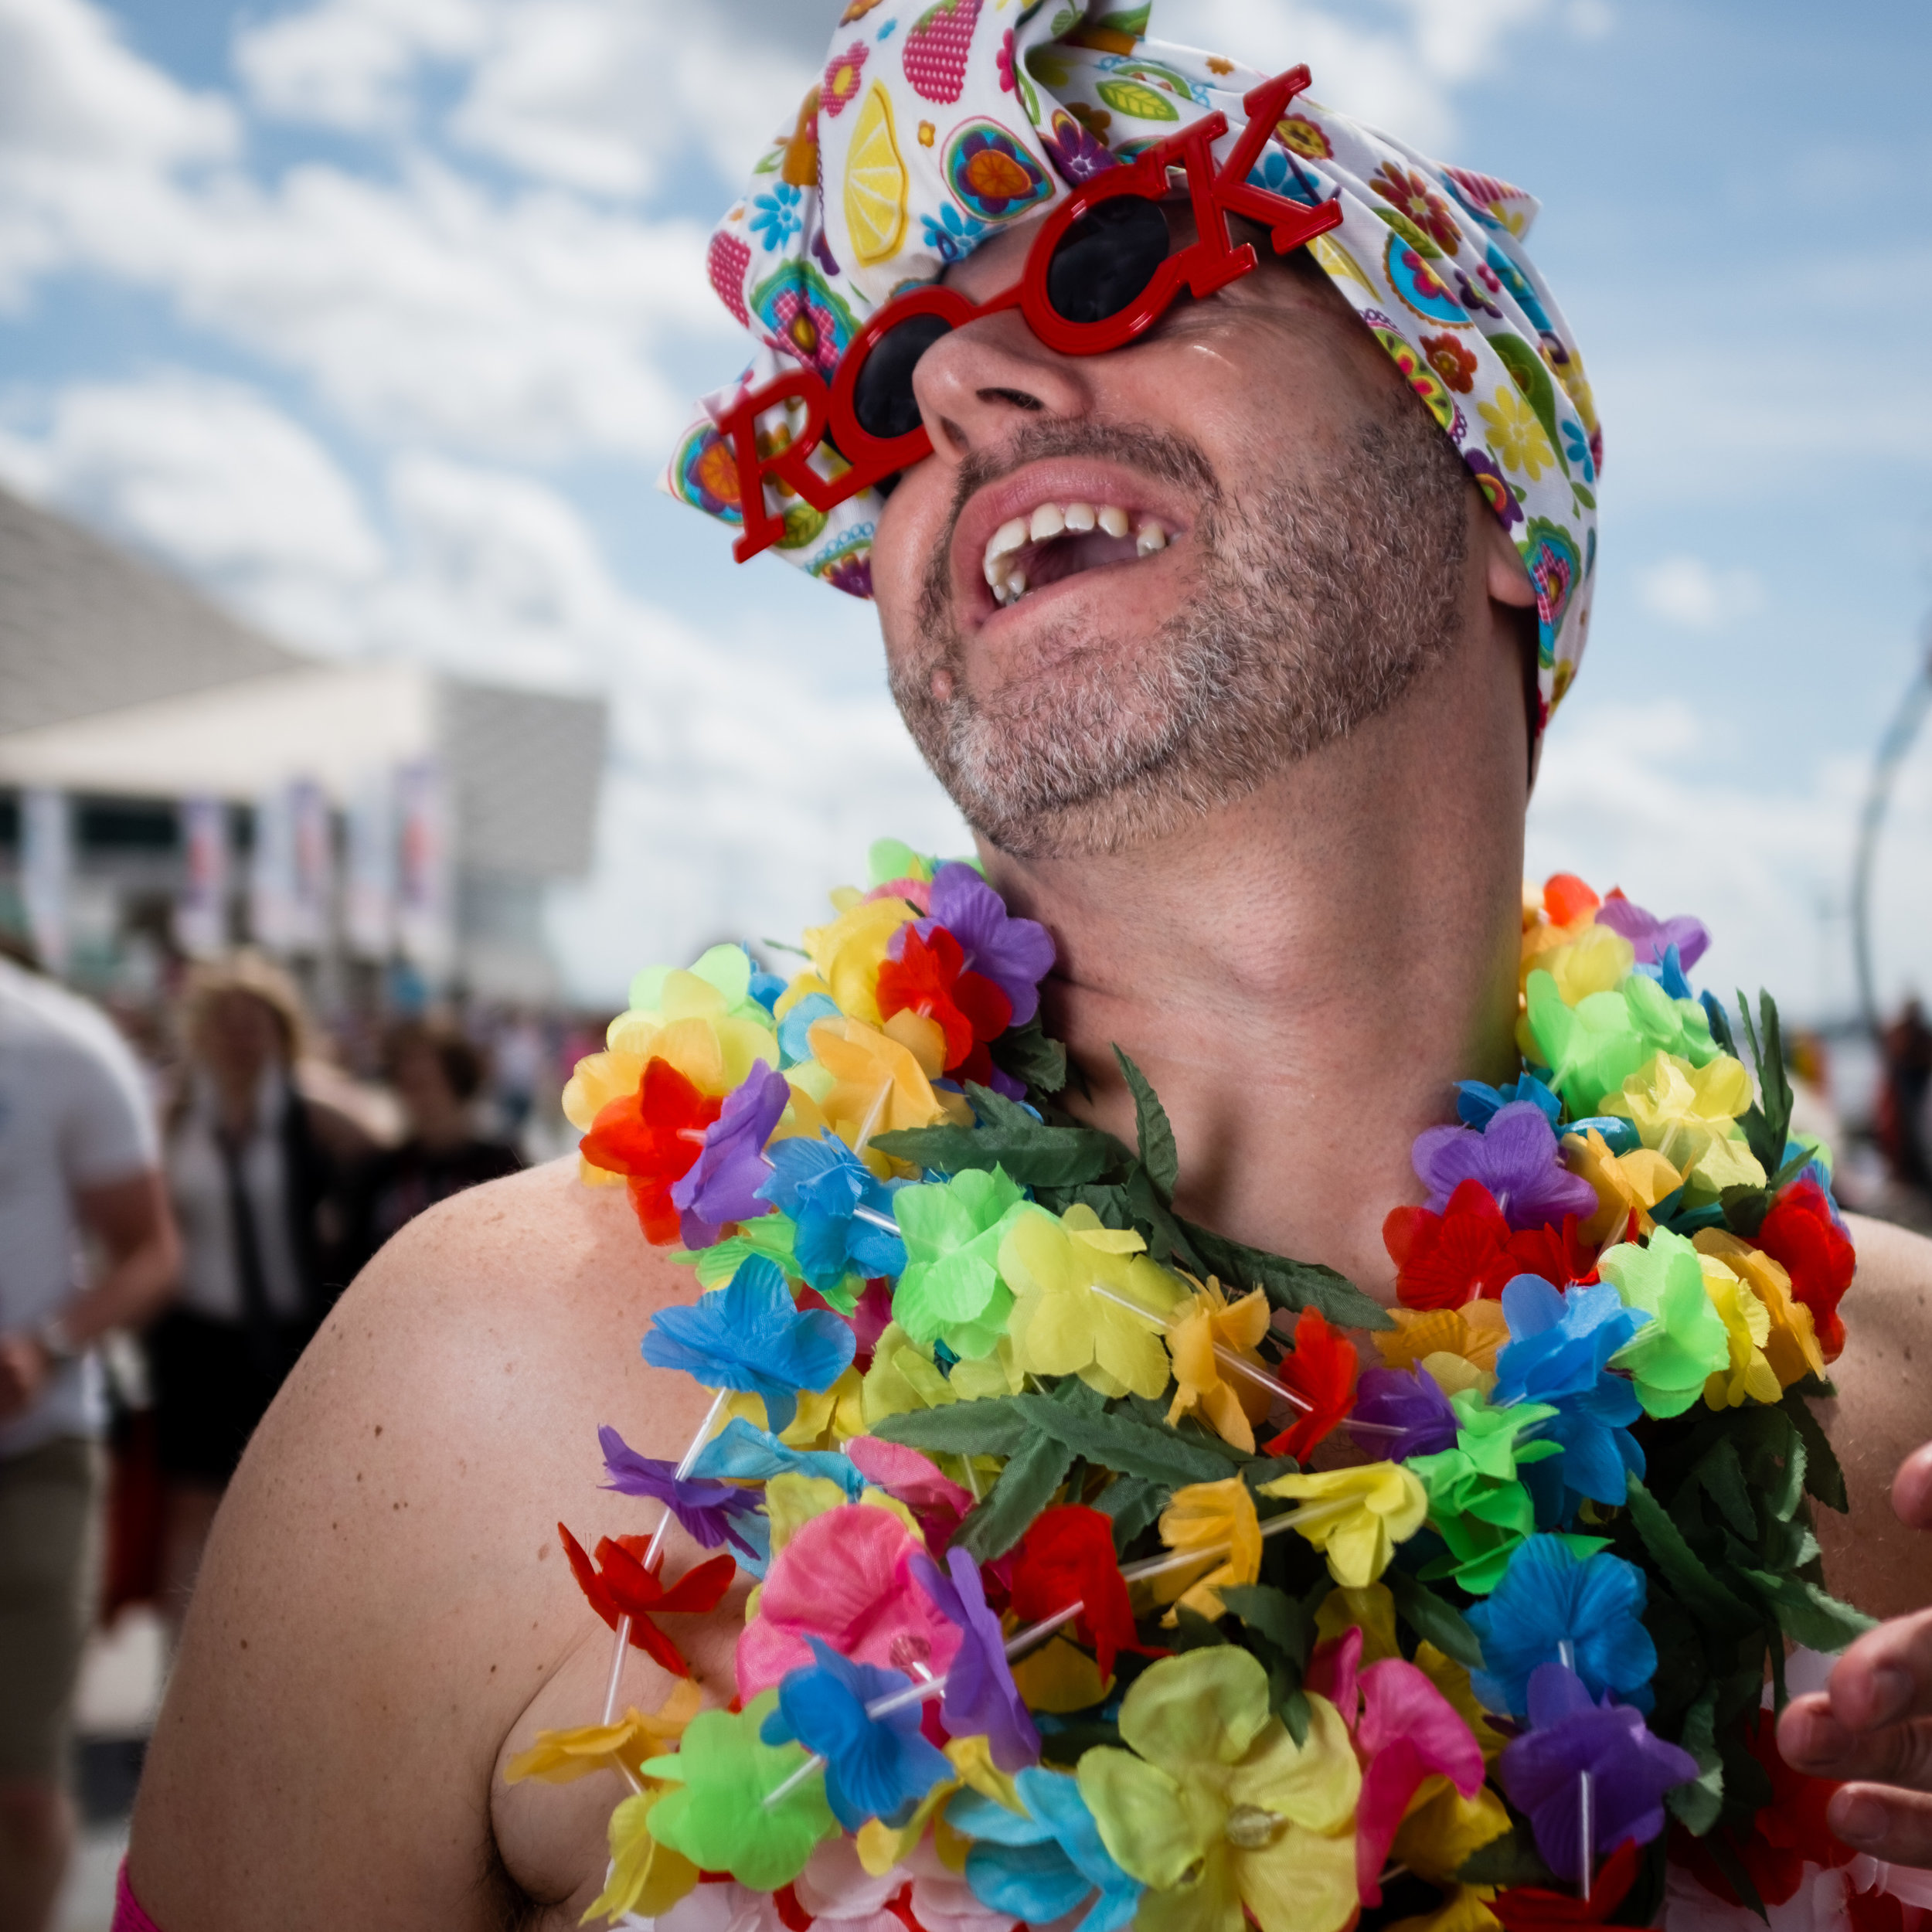 liverpool-pride-2013-5869-pete-carr.jpg